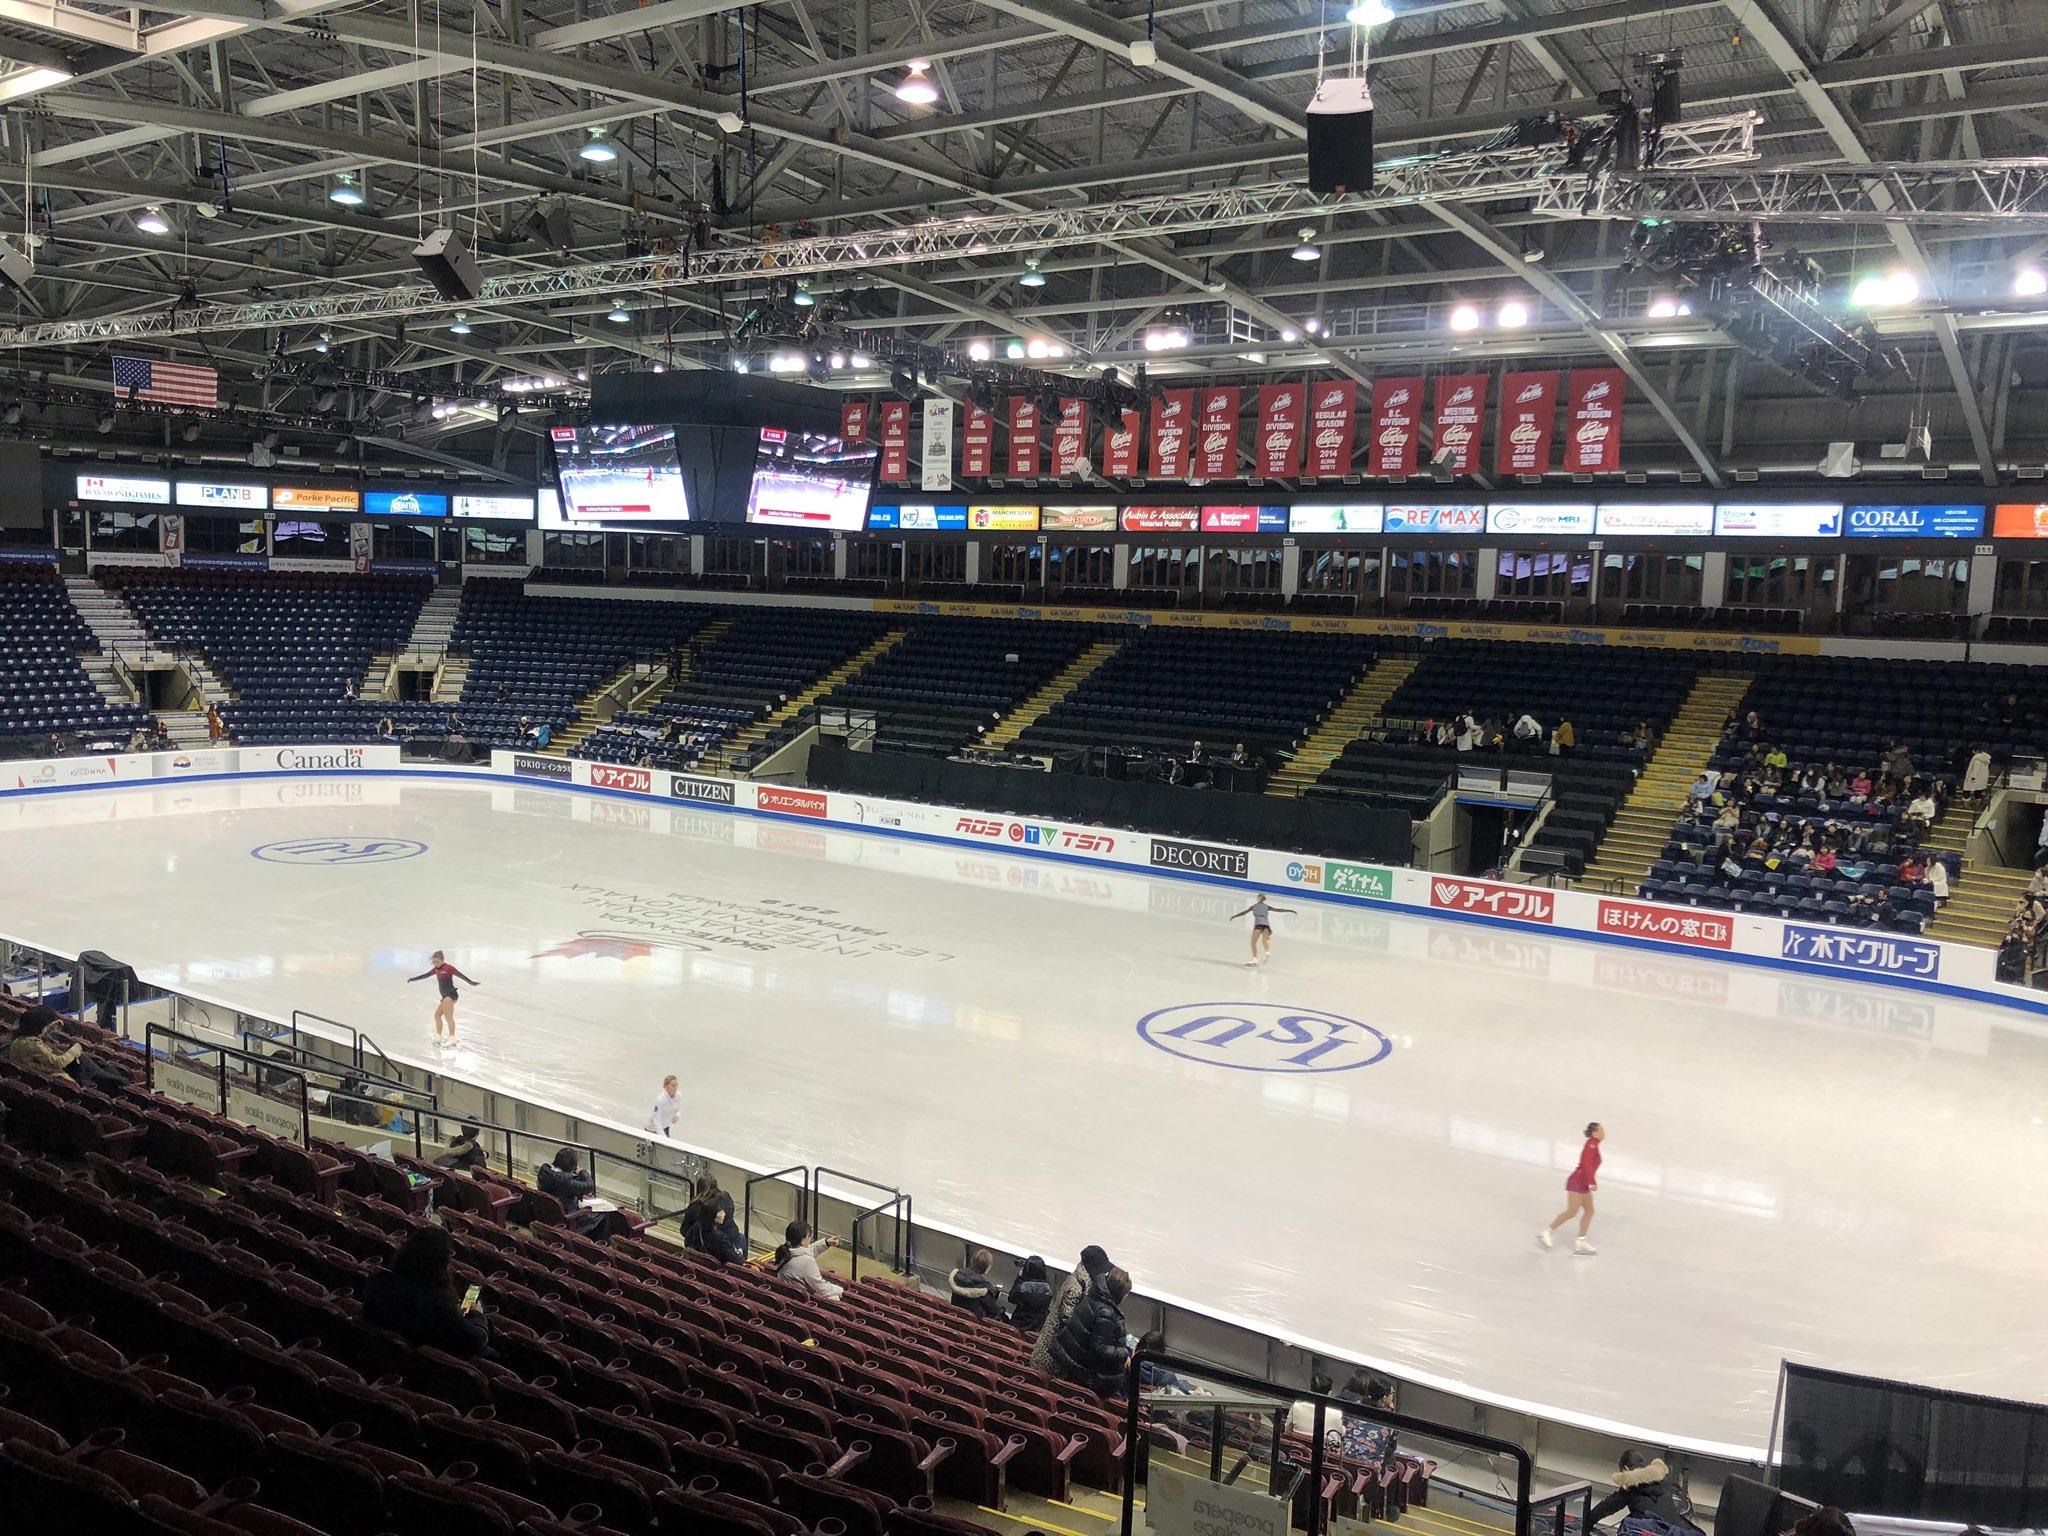 GP - 2 этап. Skate Canada International Kelowna, BC / CAN October 25-27, 2019 - Страница 14 EHz3VqcUEAQgpui?format=jpg&name=4096x4096